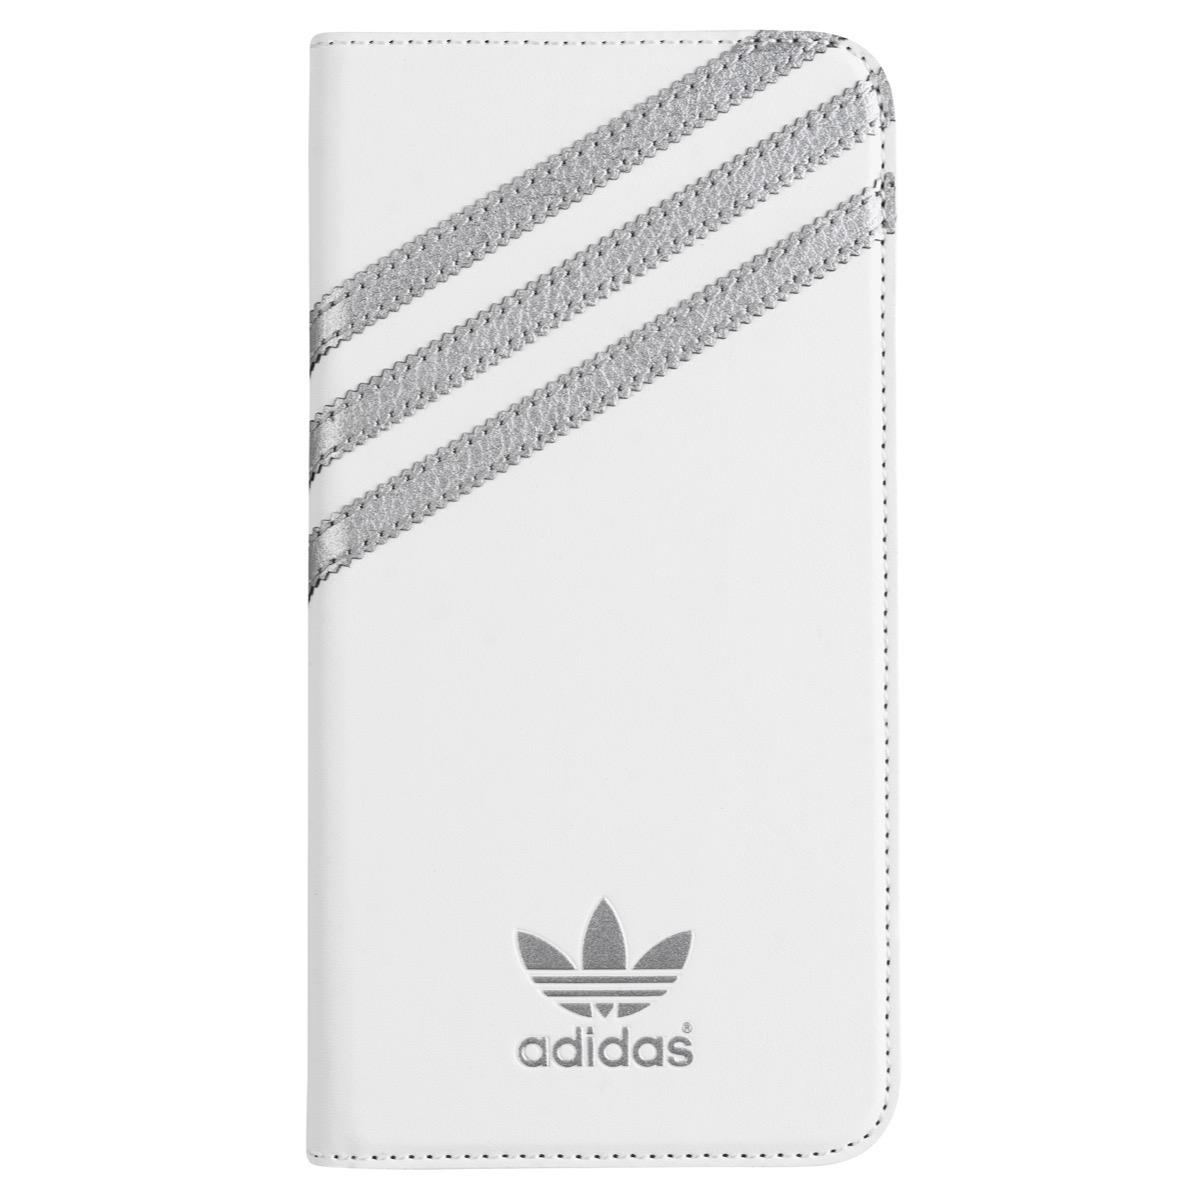 77a20f99e0 【取扱終了製品】adidas Originals Booklet Case iPhone 6 Plus White/Silver